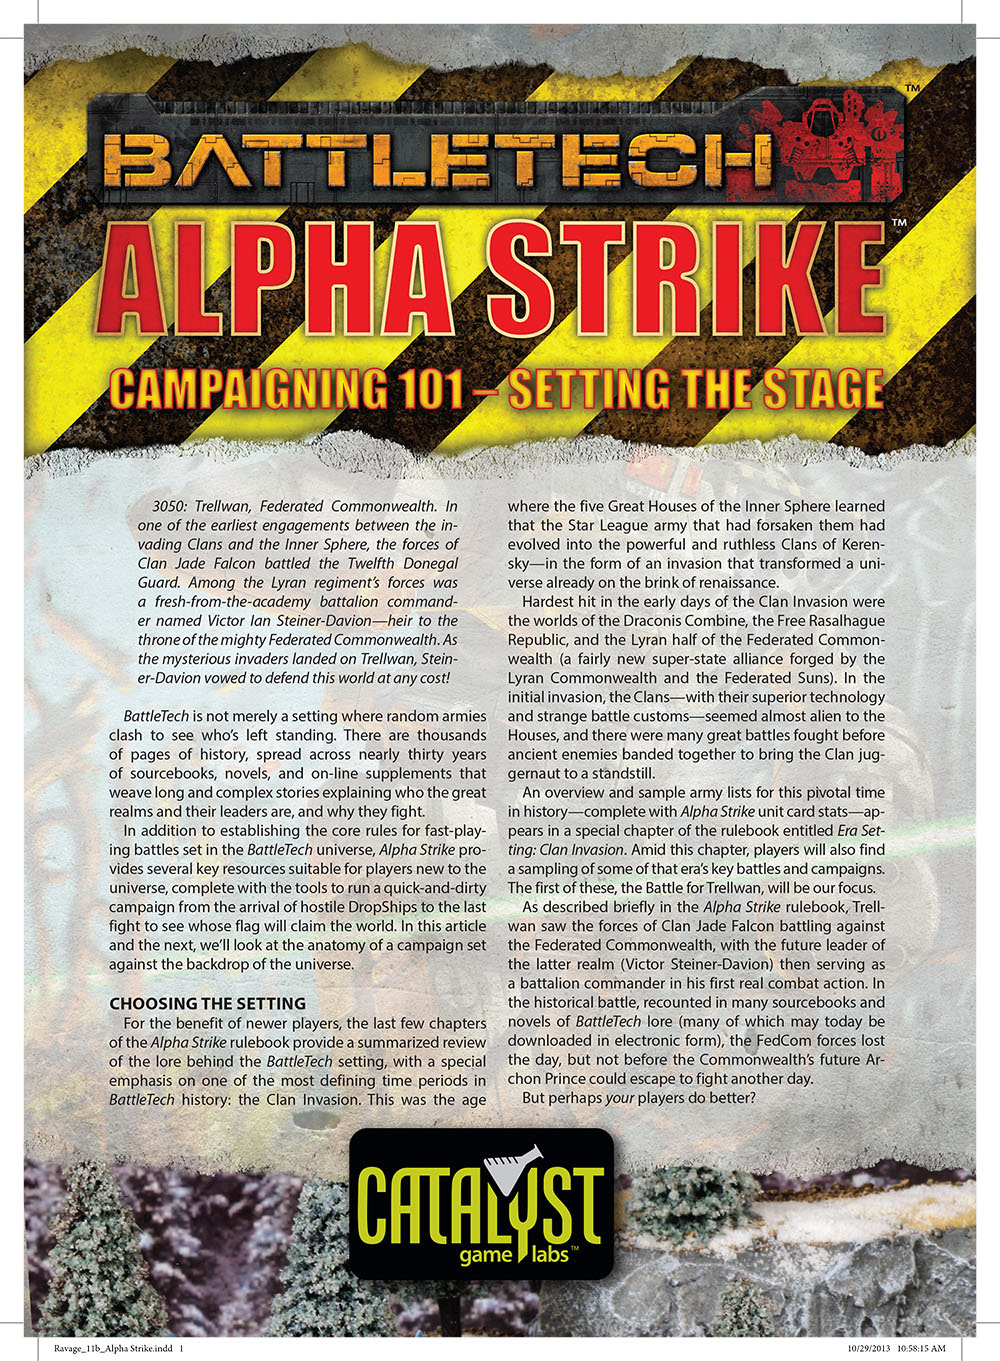 Ravage_11_Alpha StrikeArticle-Page1